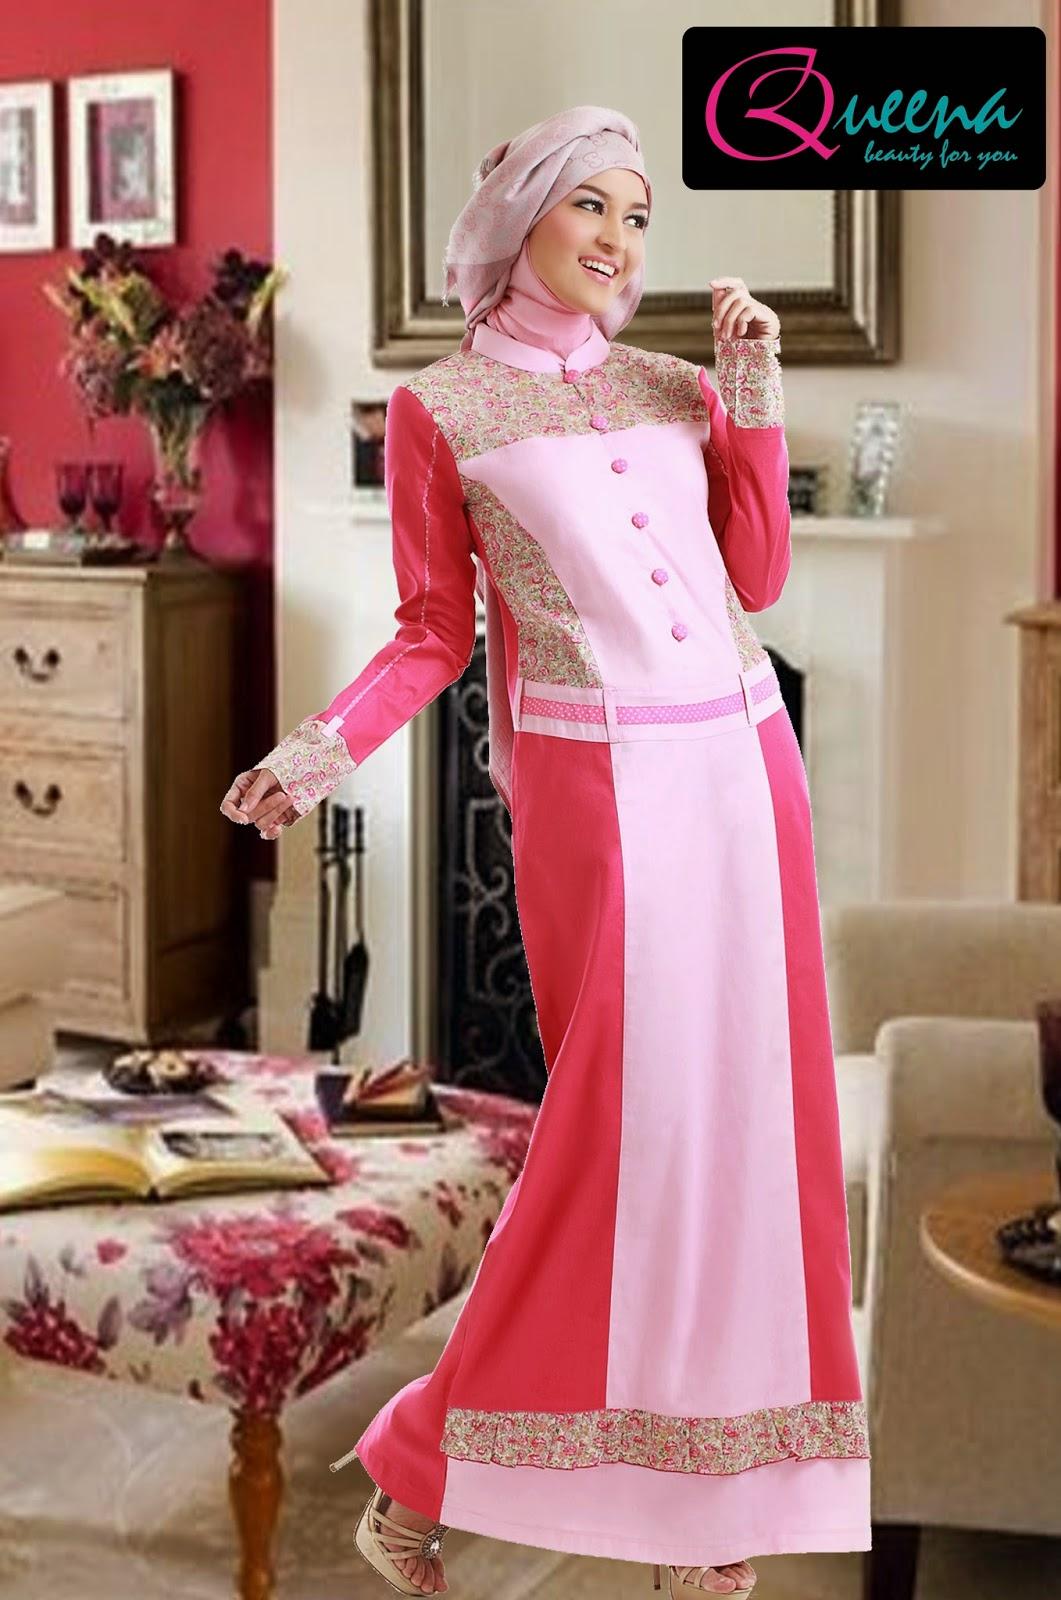 16 Contoh Model Baju Muslim Untuk Pesta Terbaik Kumpulan